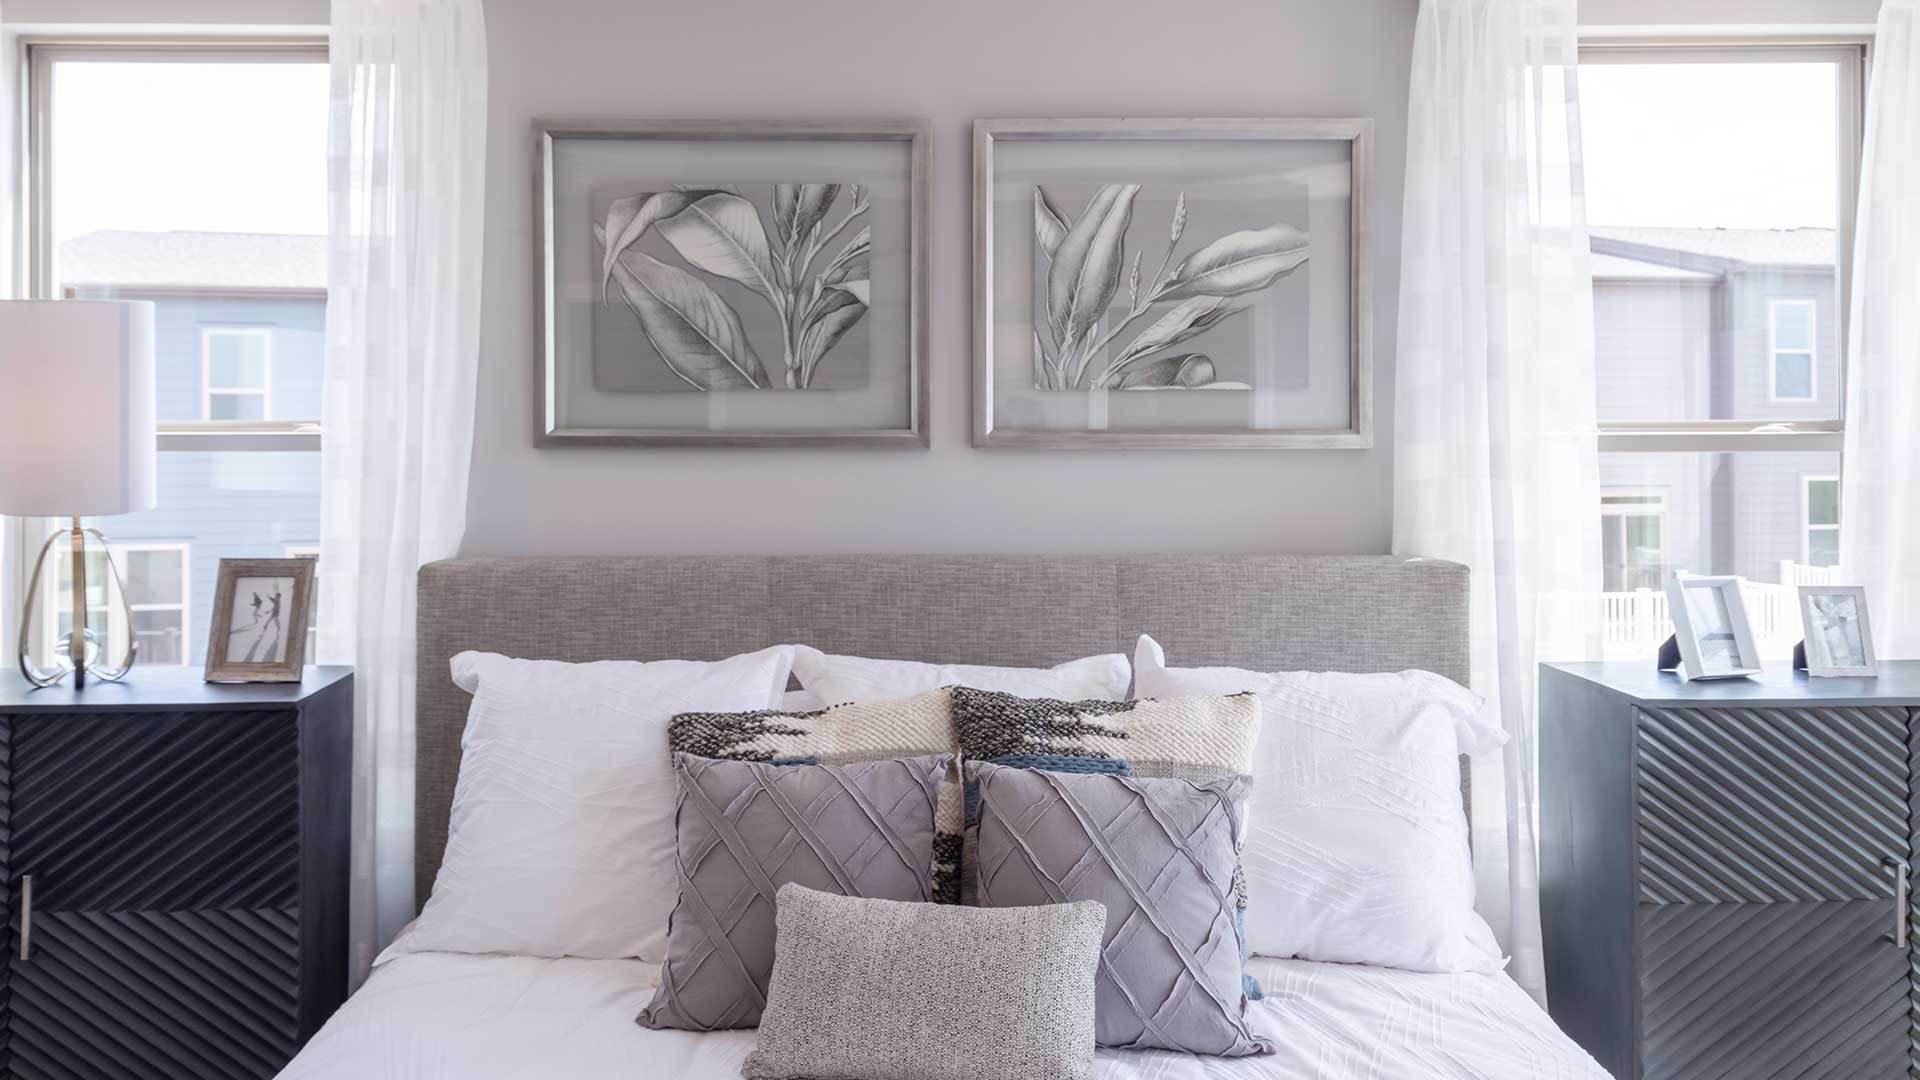 Bedroom featured in the Bridget By Stanley Martin Homes in Atlanta, GA